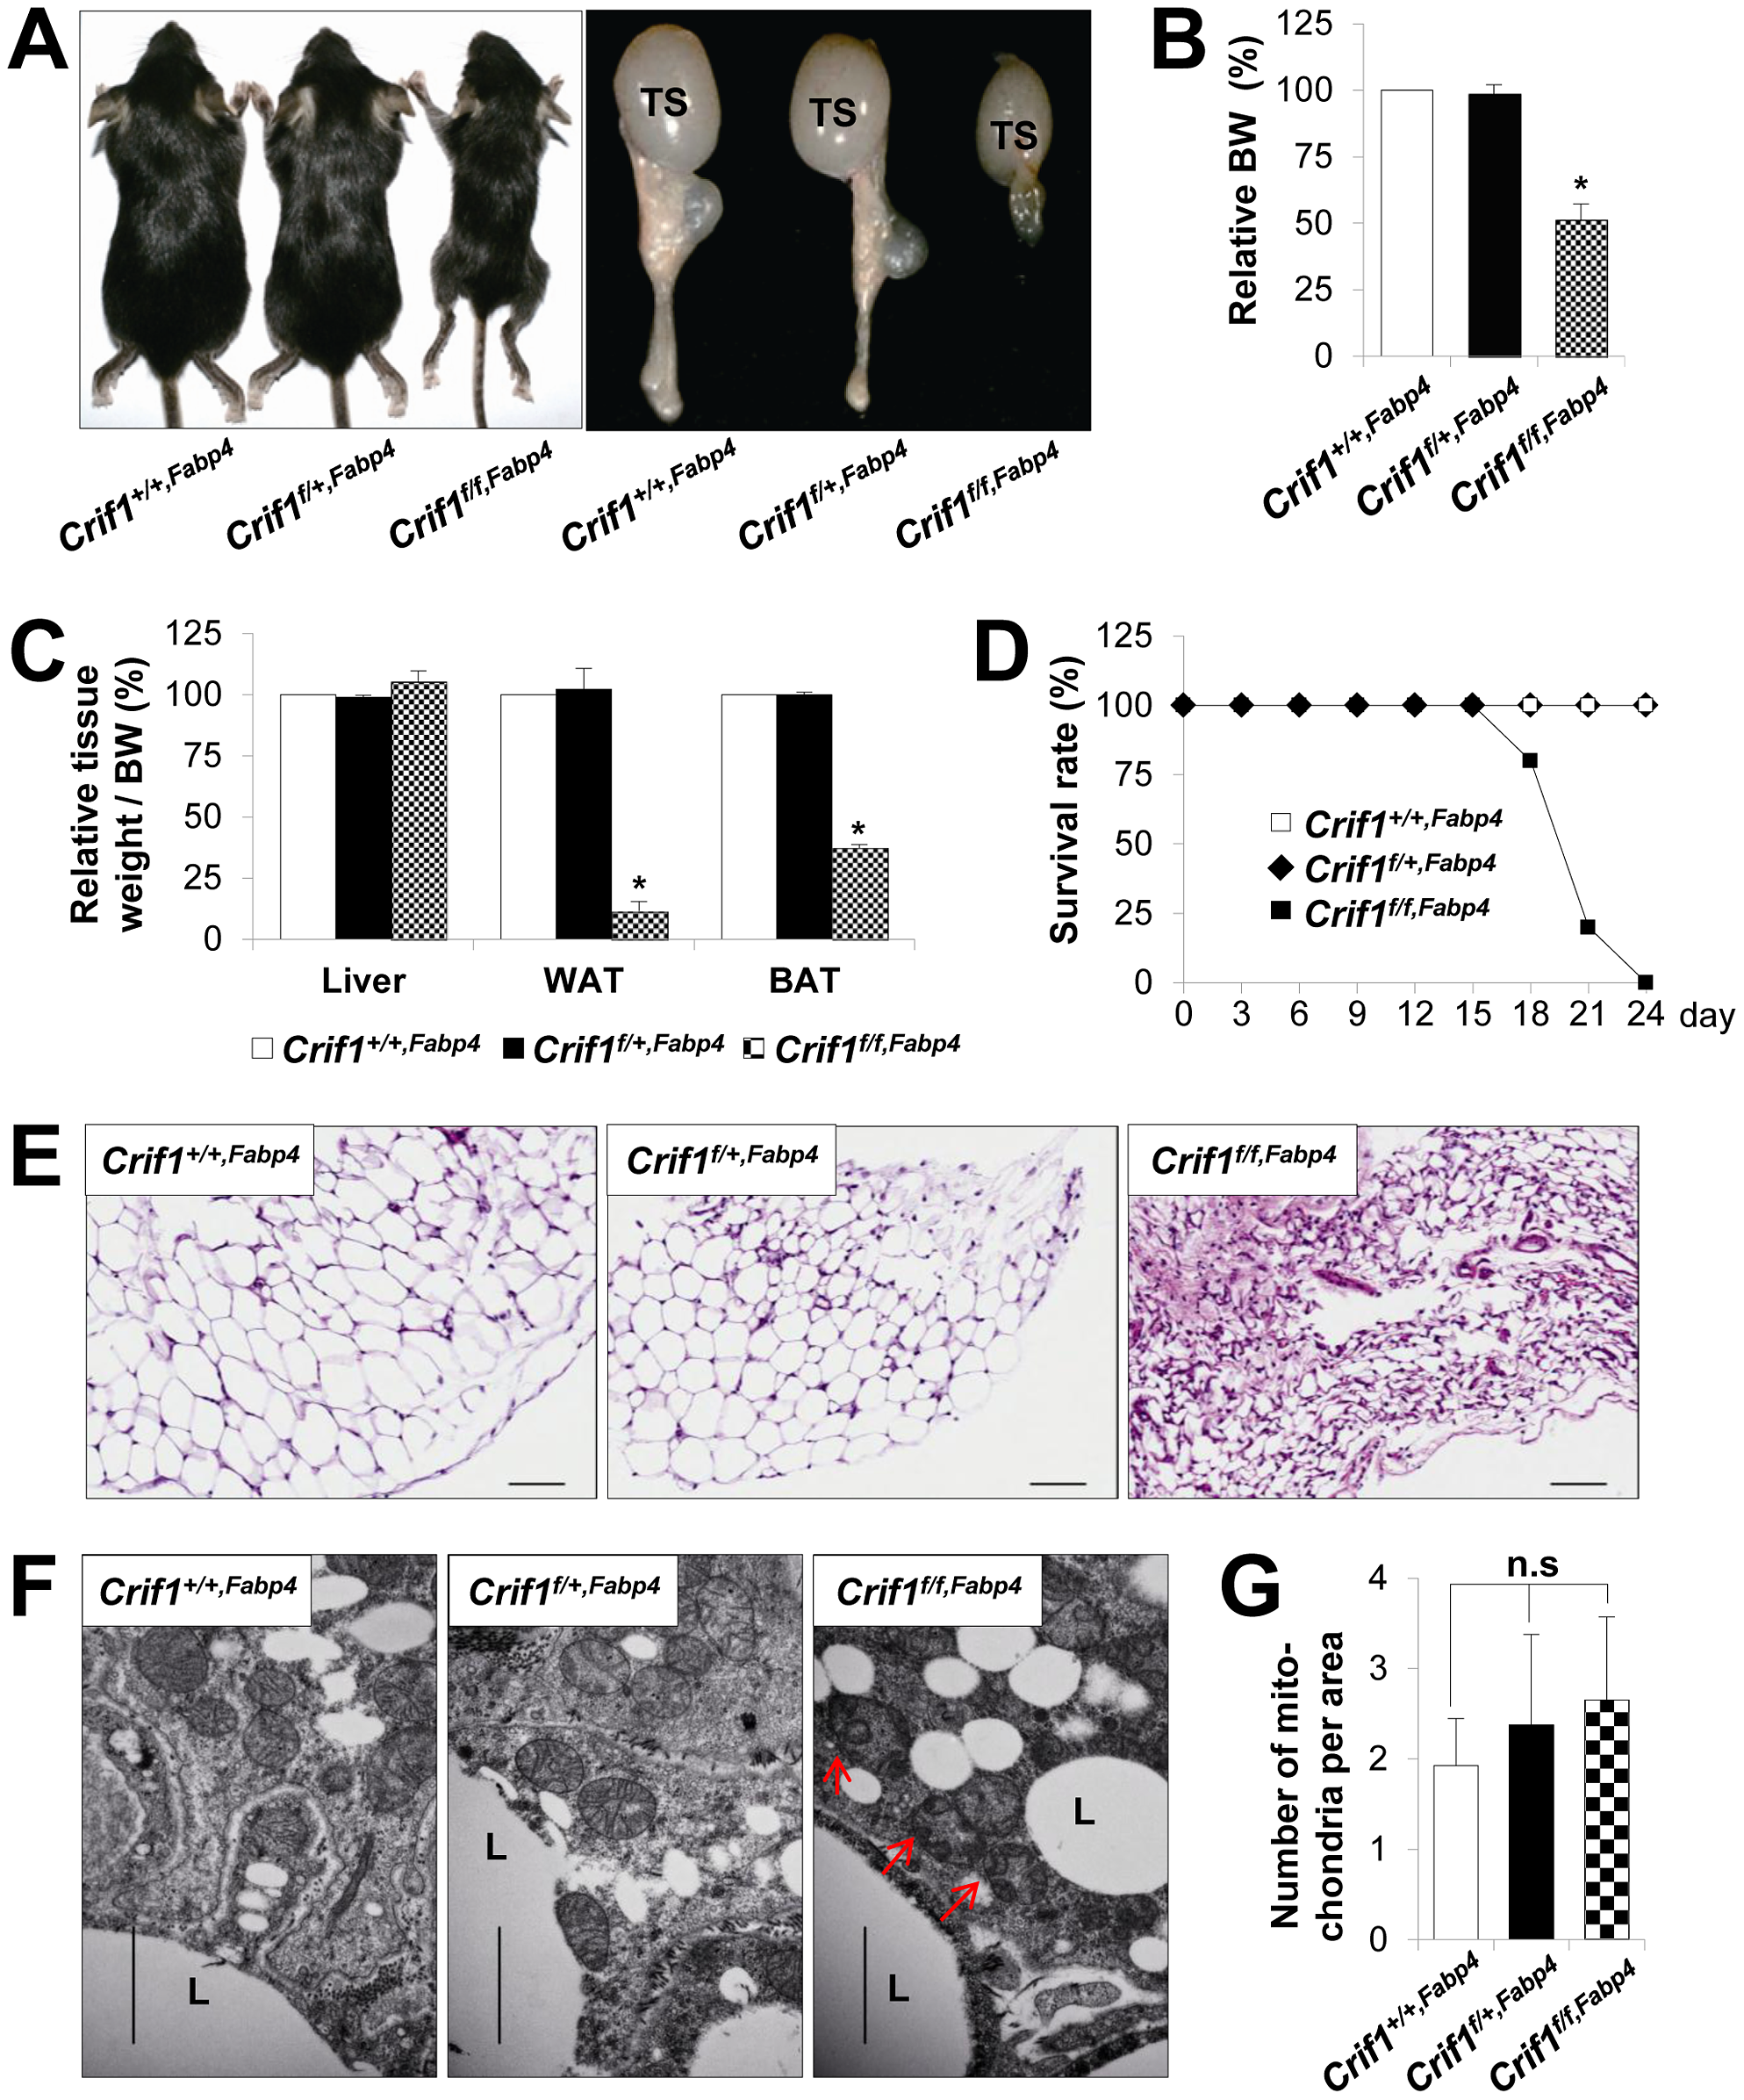 Marked failure of adipose tissue development in <i>Crif1<sup>f/f,Fabp4</sup></i> mice.